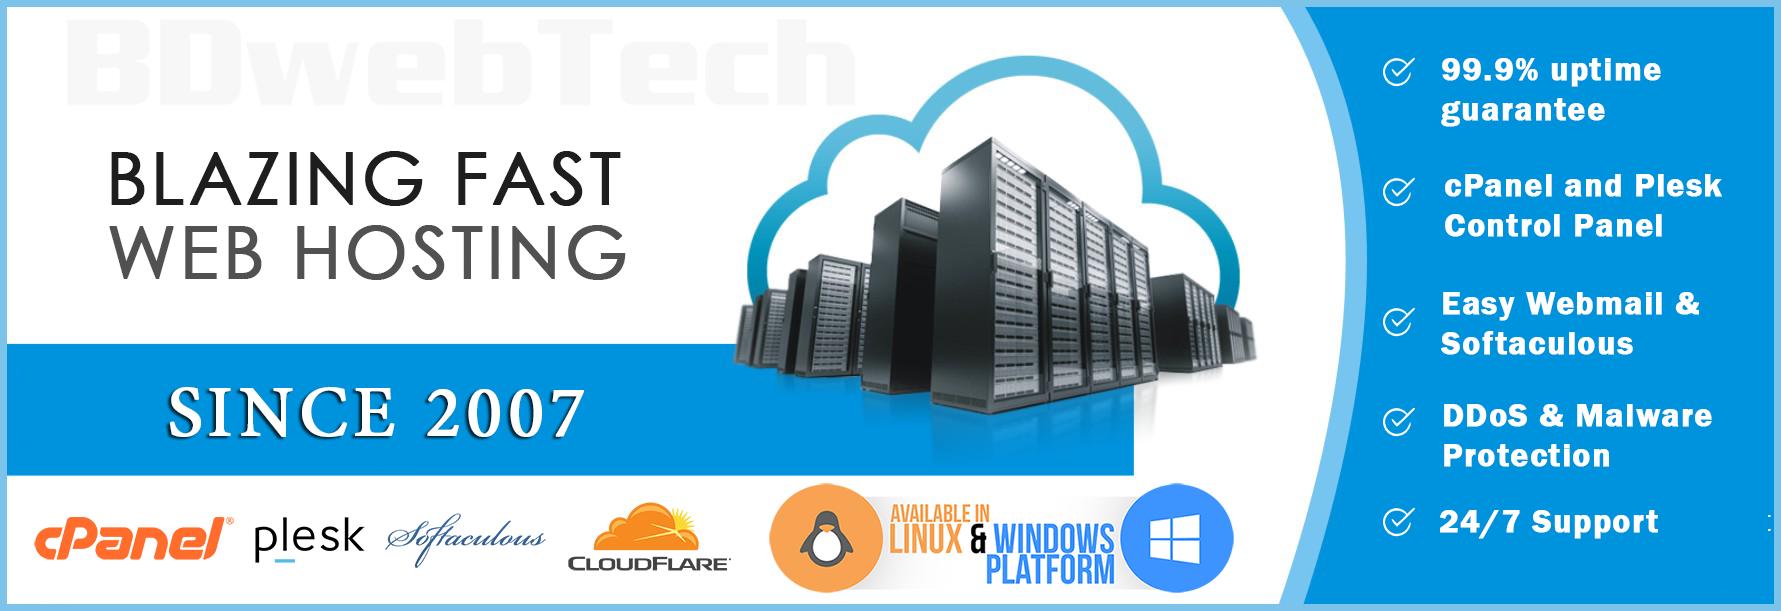 bdwebtech-Web-Hosting-Banner